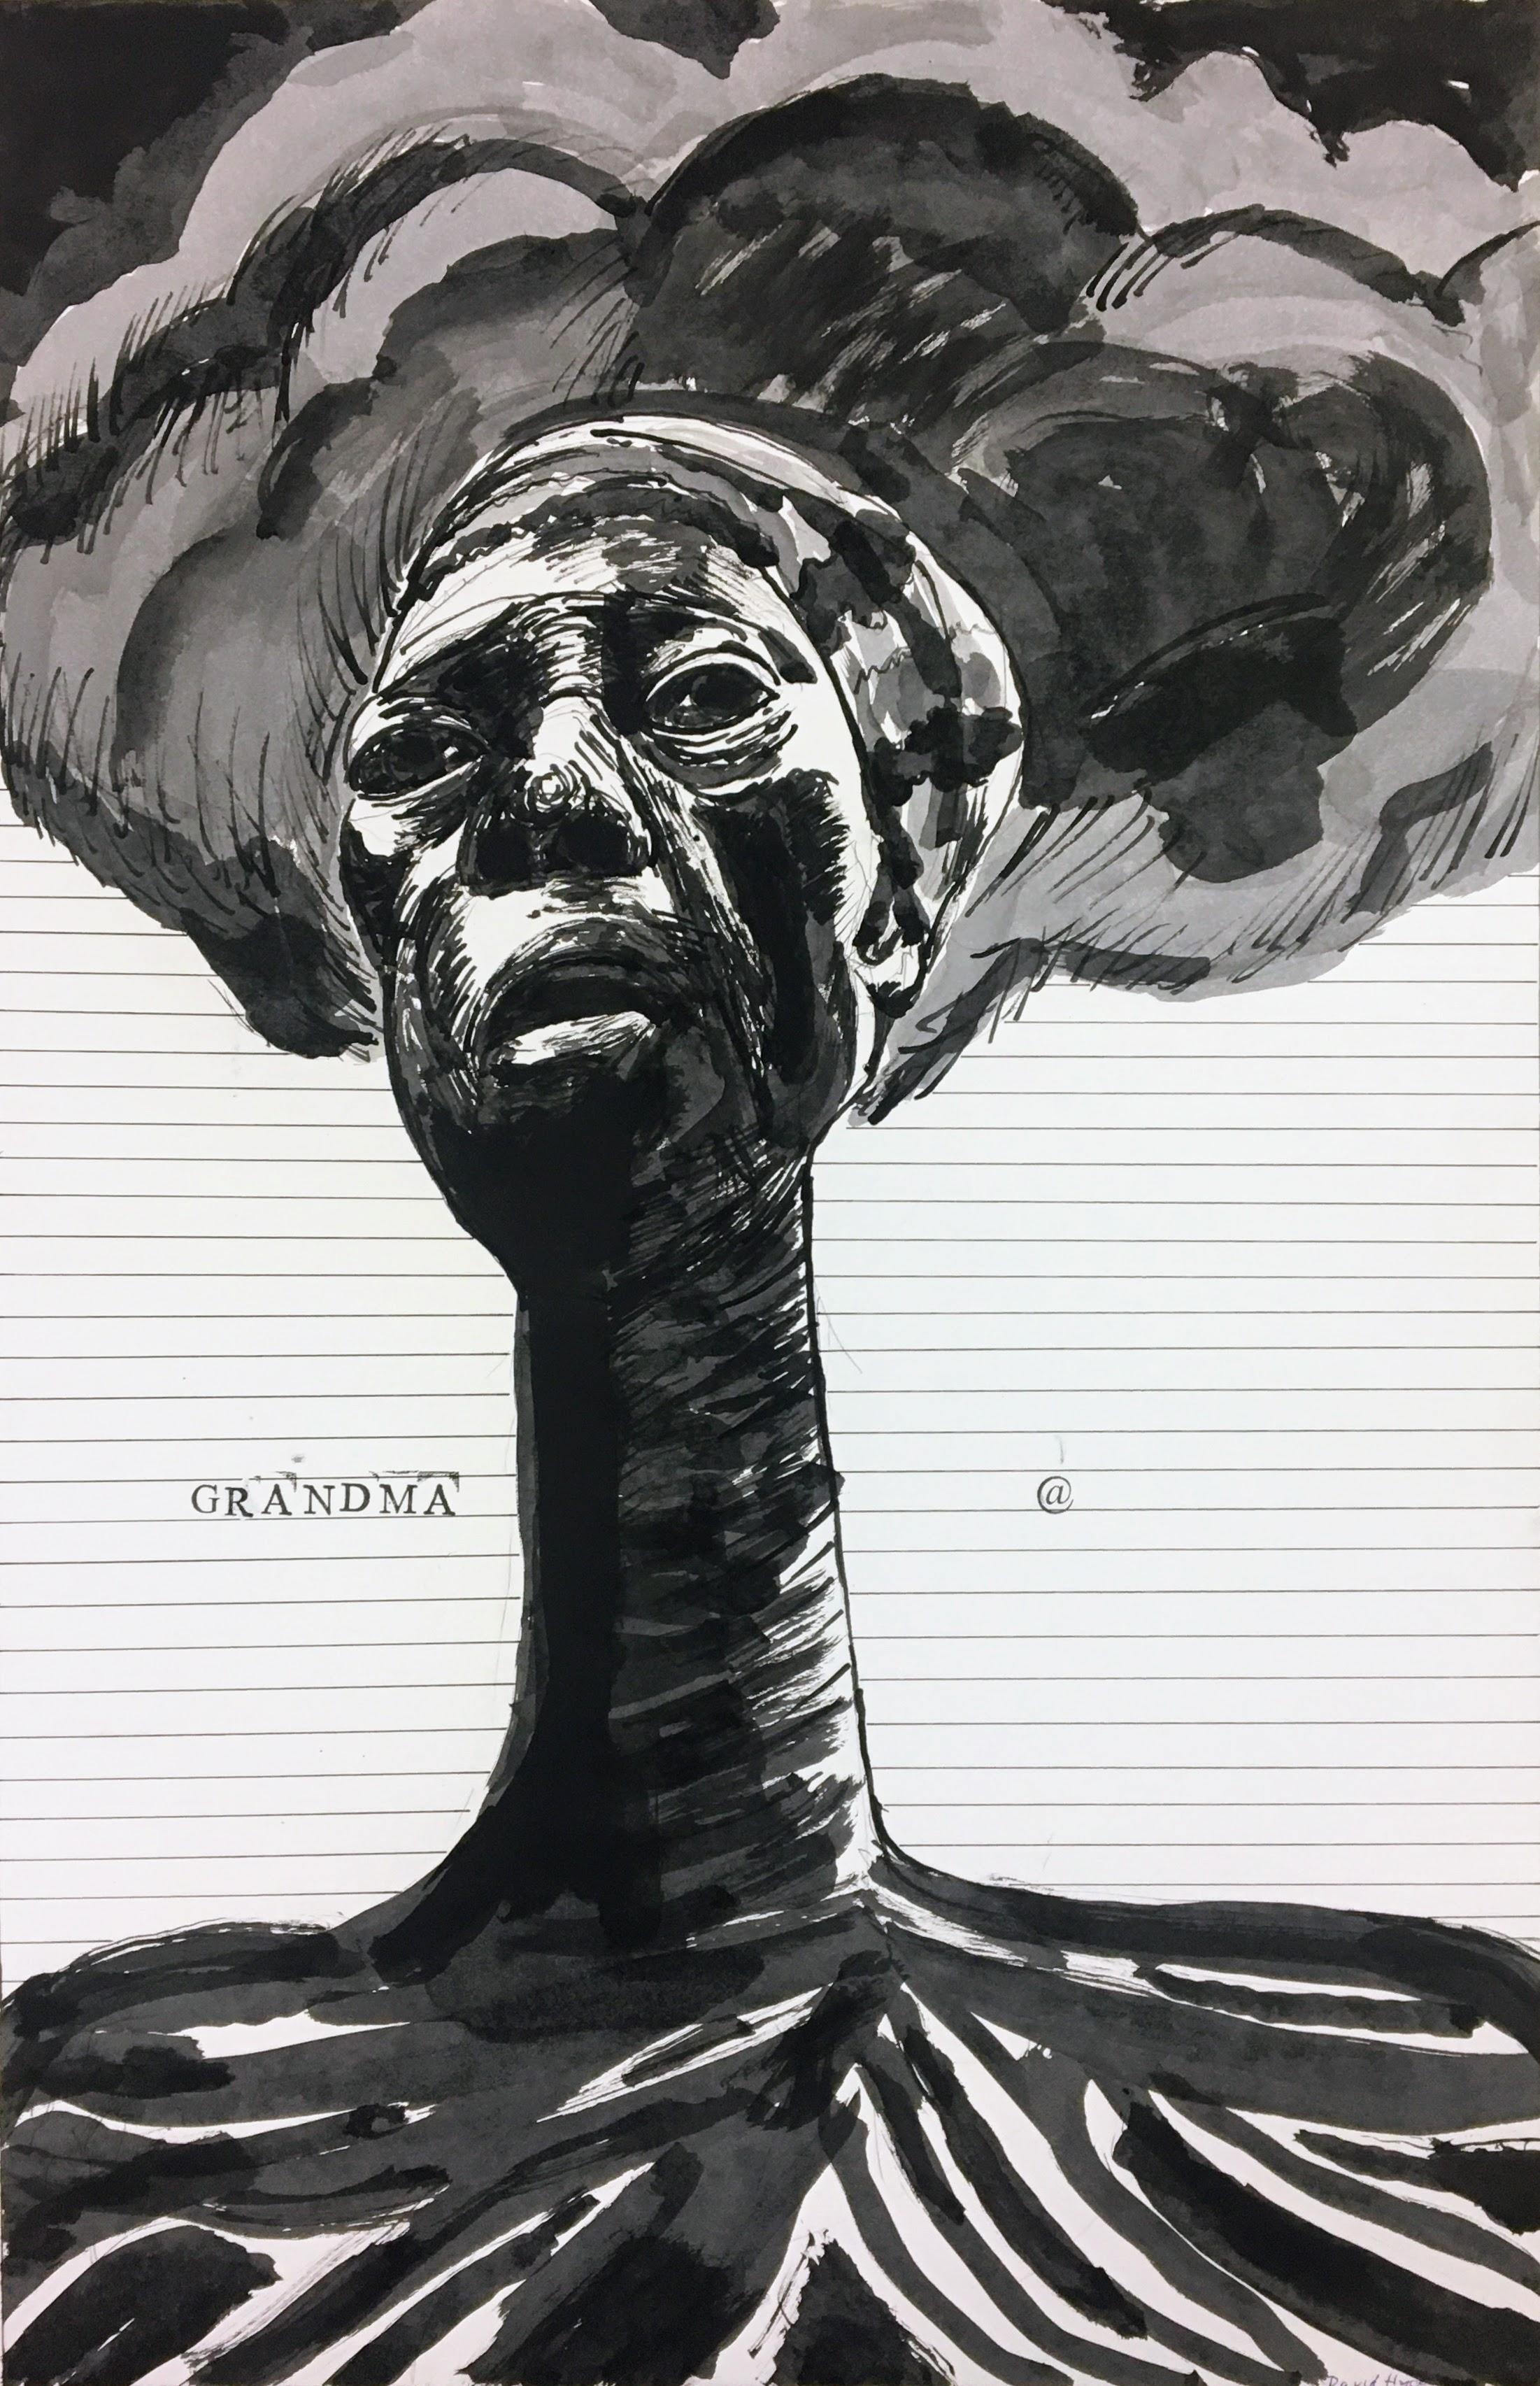 """Grandma"" by David Hence"